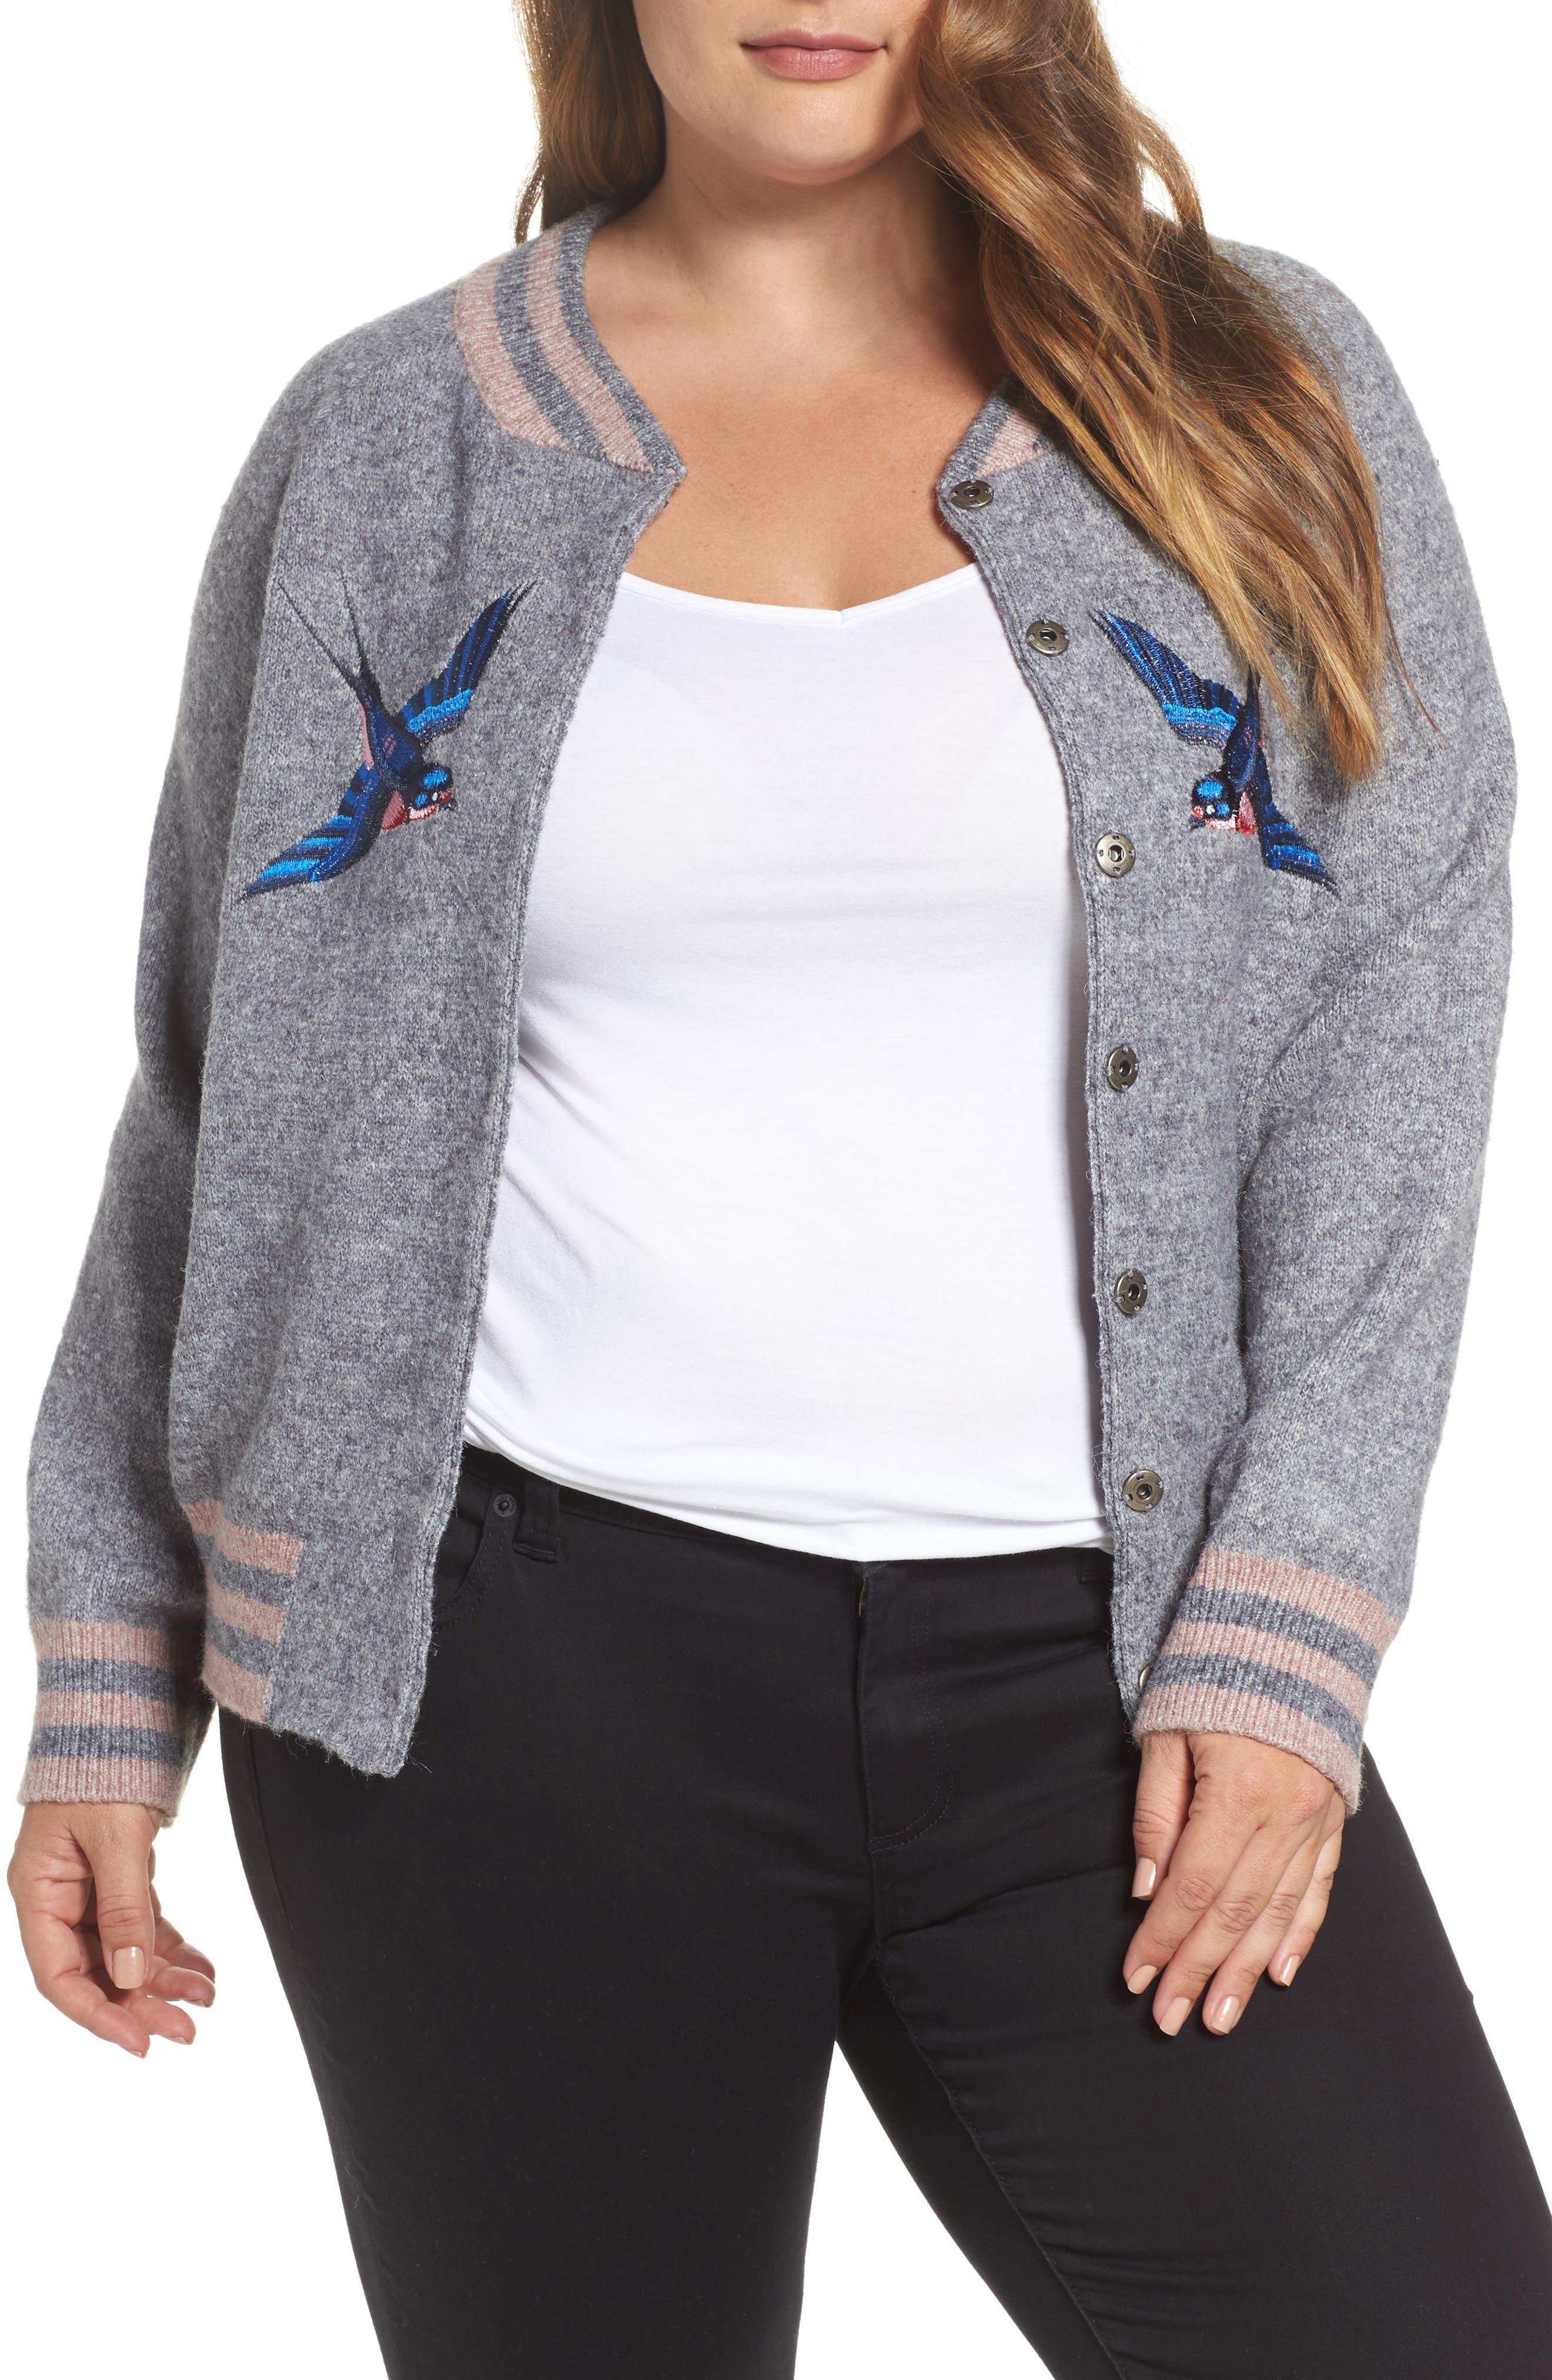 Zanja Embroidered Knit Bomber Jacket,                         Main,                         color, Medium Grey Melange